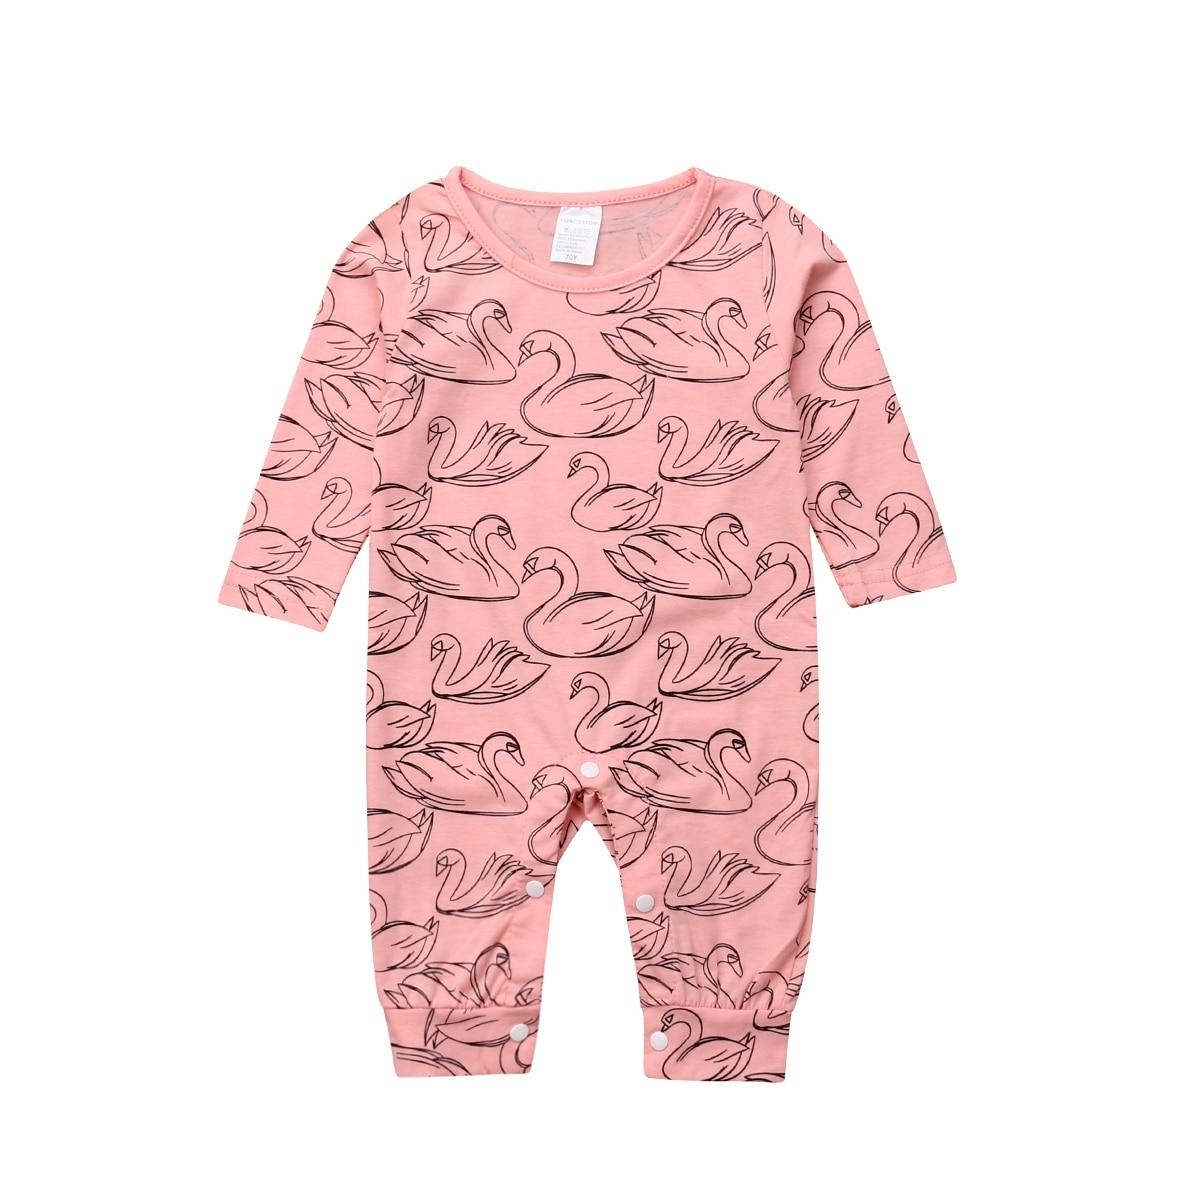 Newborn Kids Baby Girls Cartoon Swan   Romper   Cotton Long Sleeve Jumpsuit Clothes